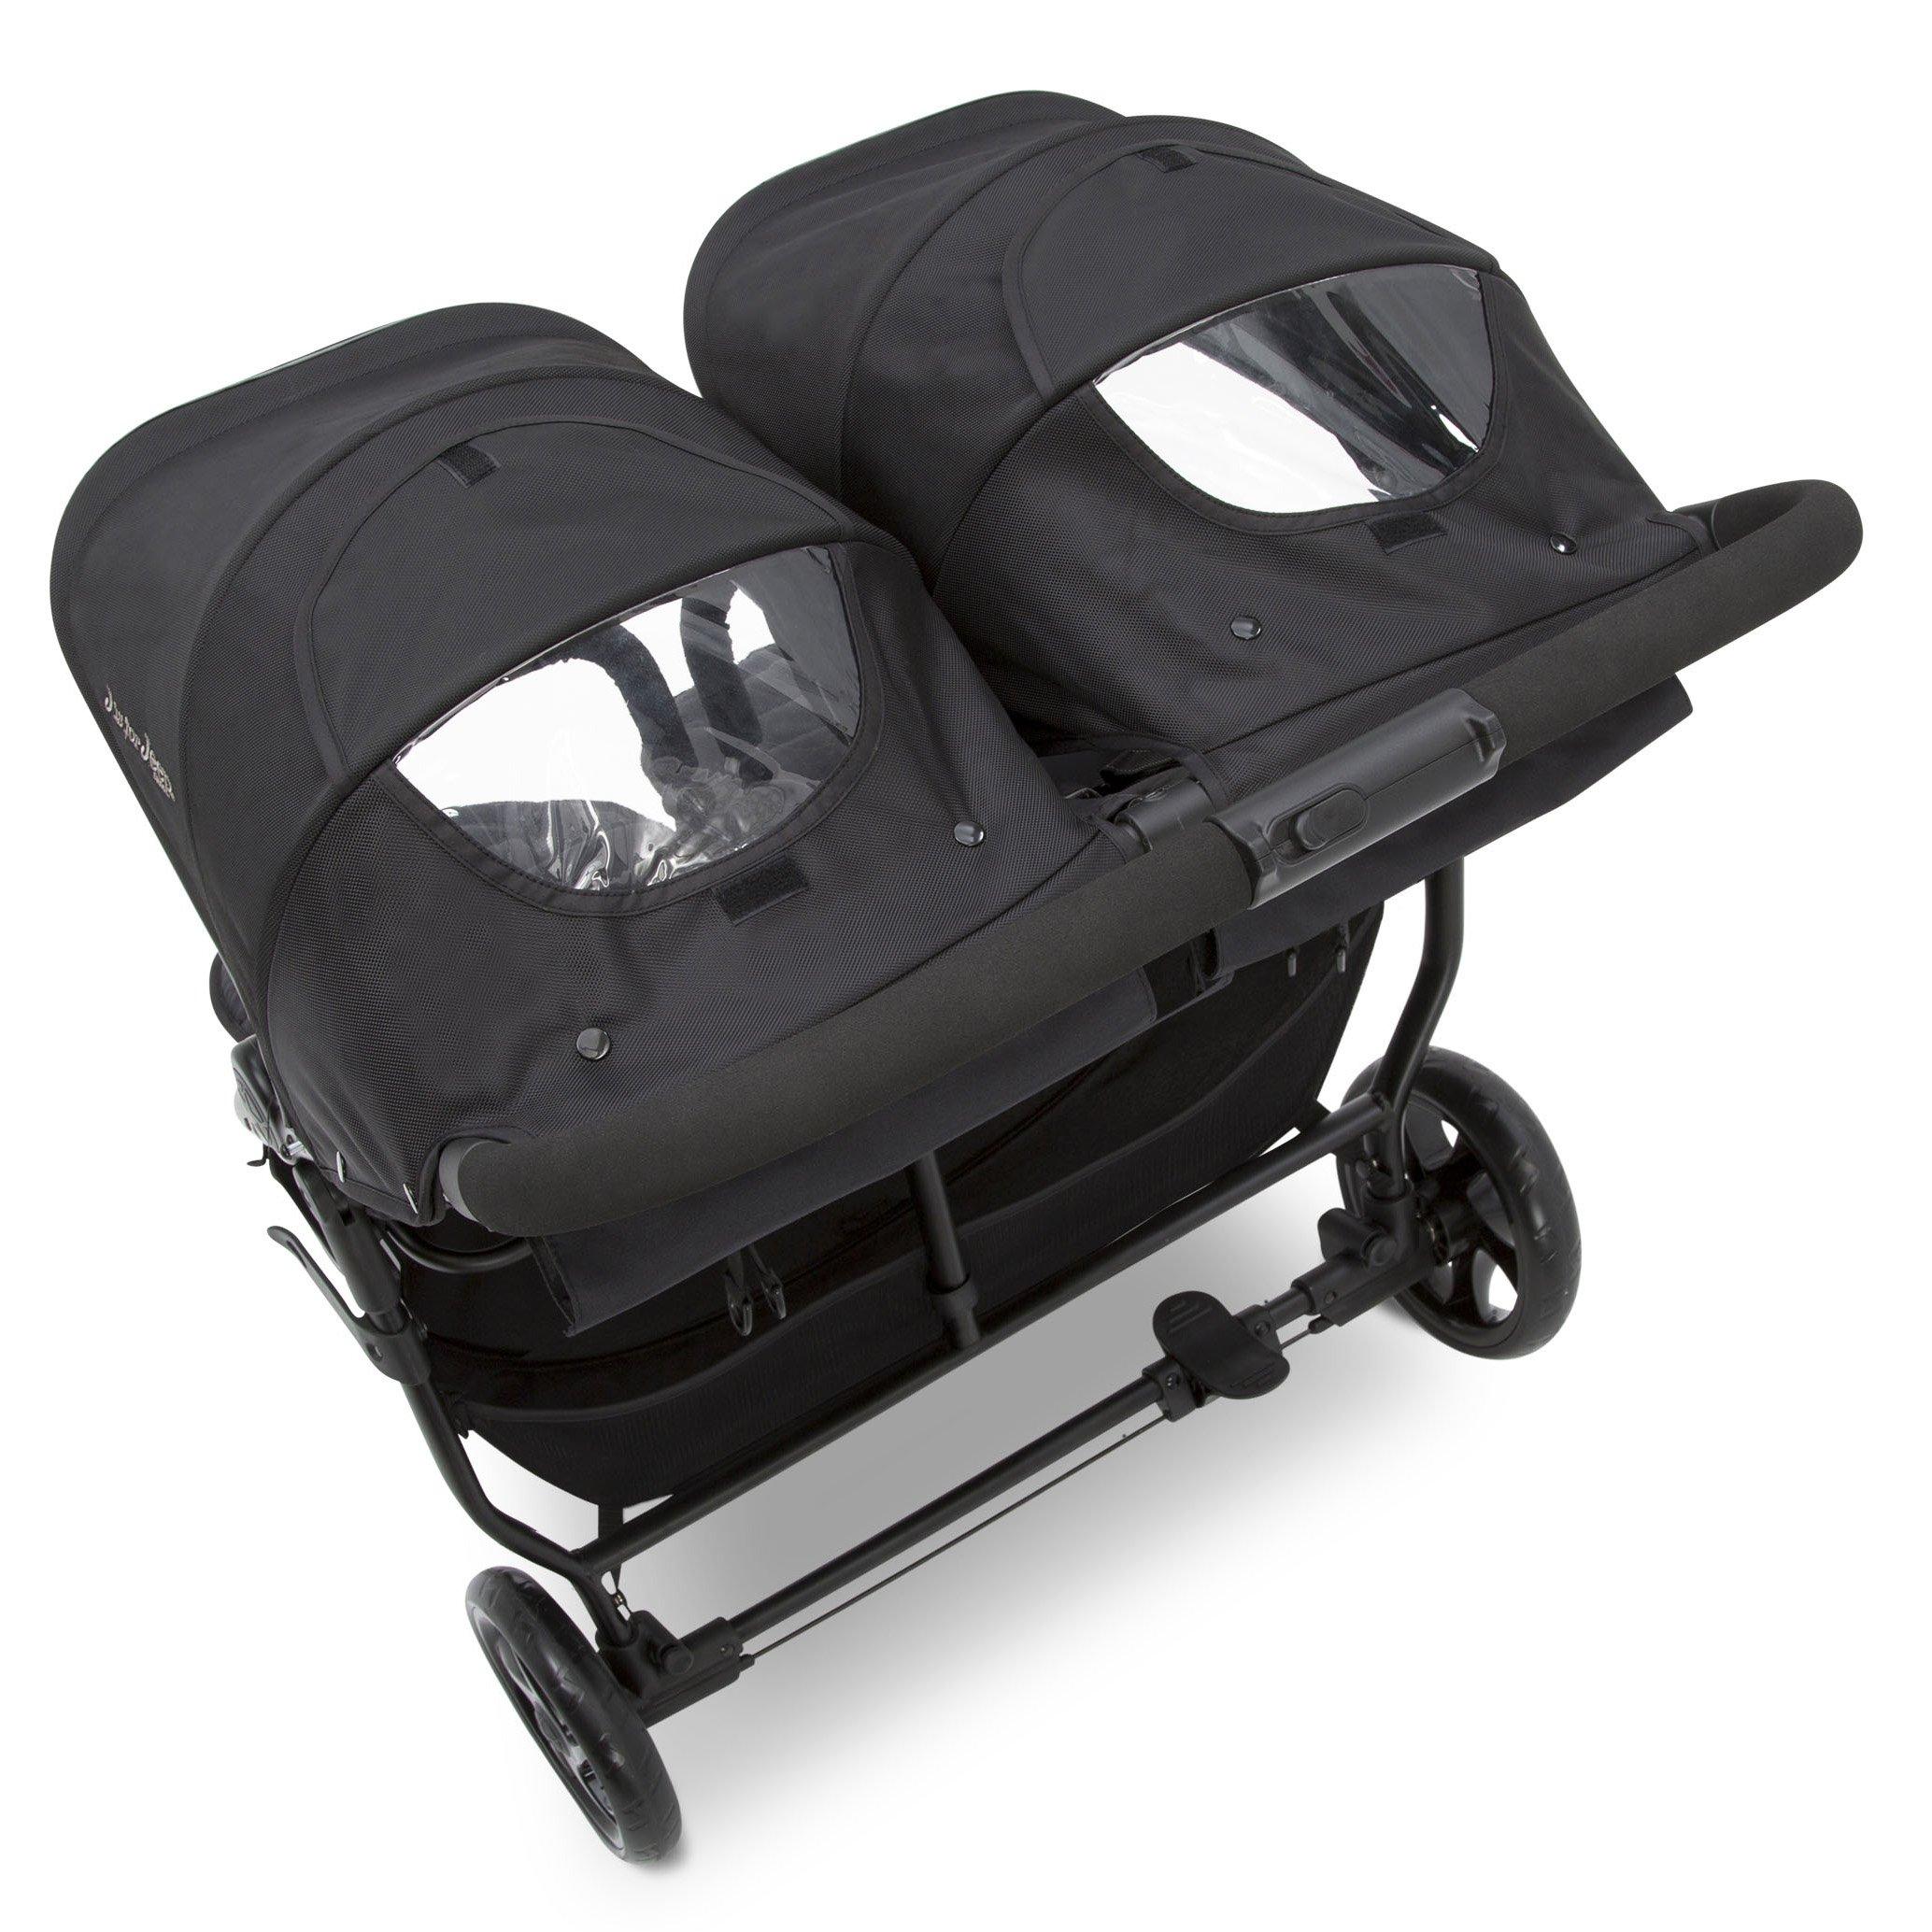 Jeep Destination Ultralight Side x Side Double Stroller, Midnight (Black) by Delta Children (Image #6)